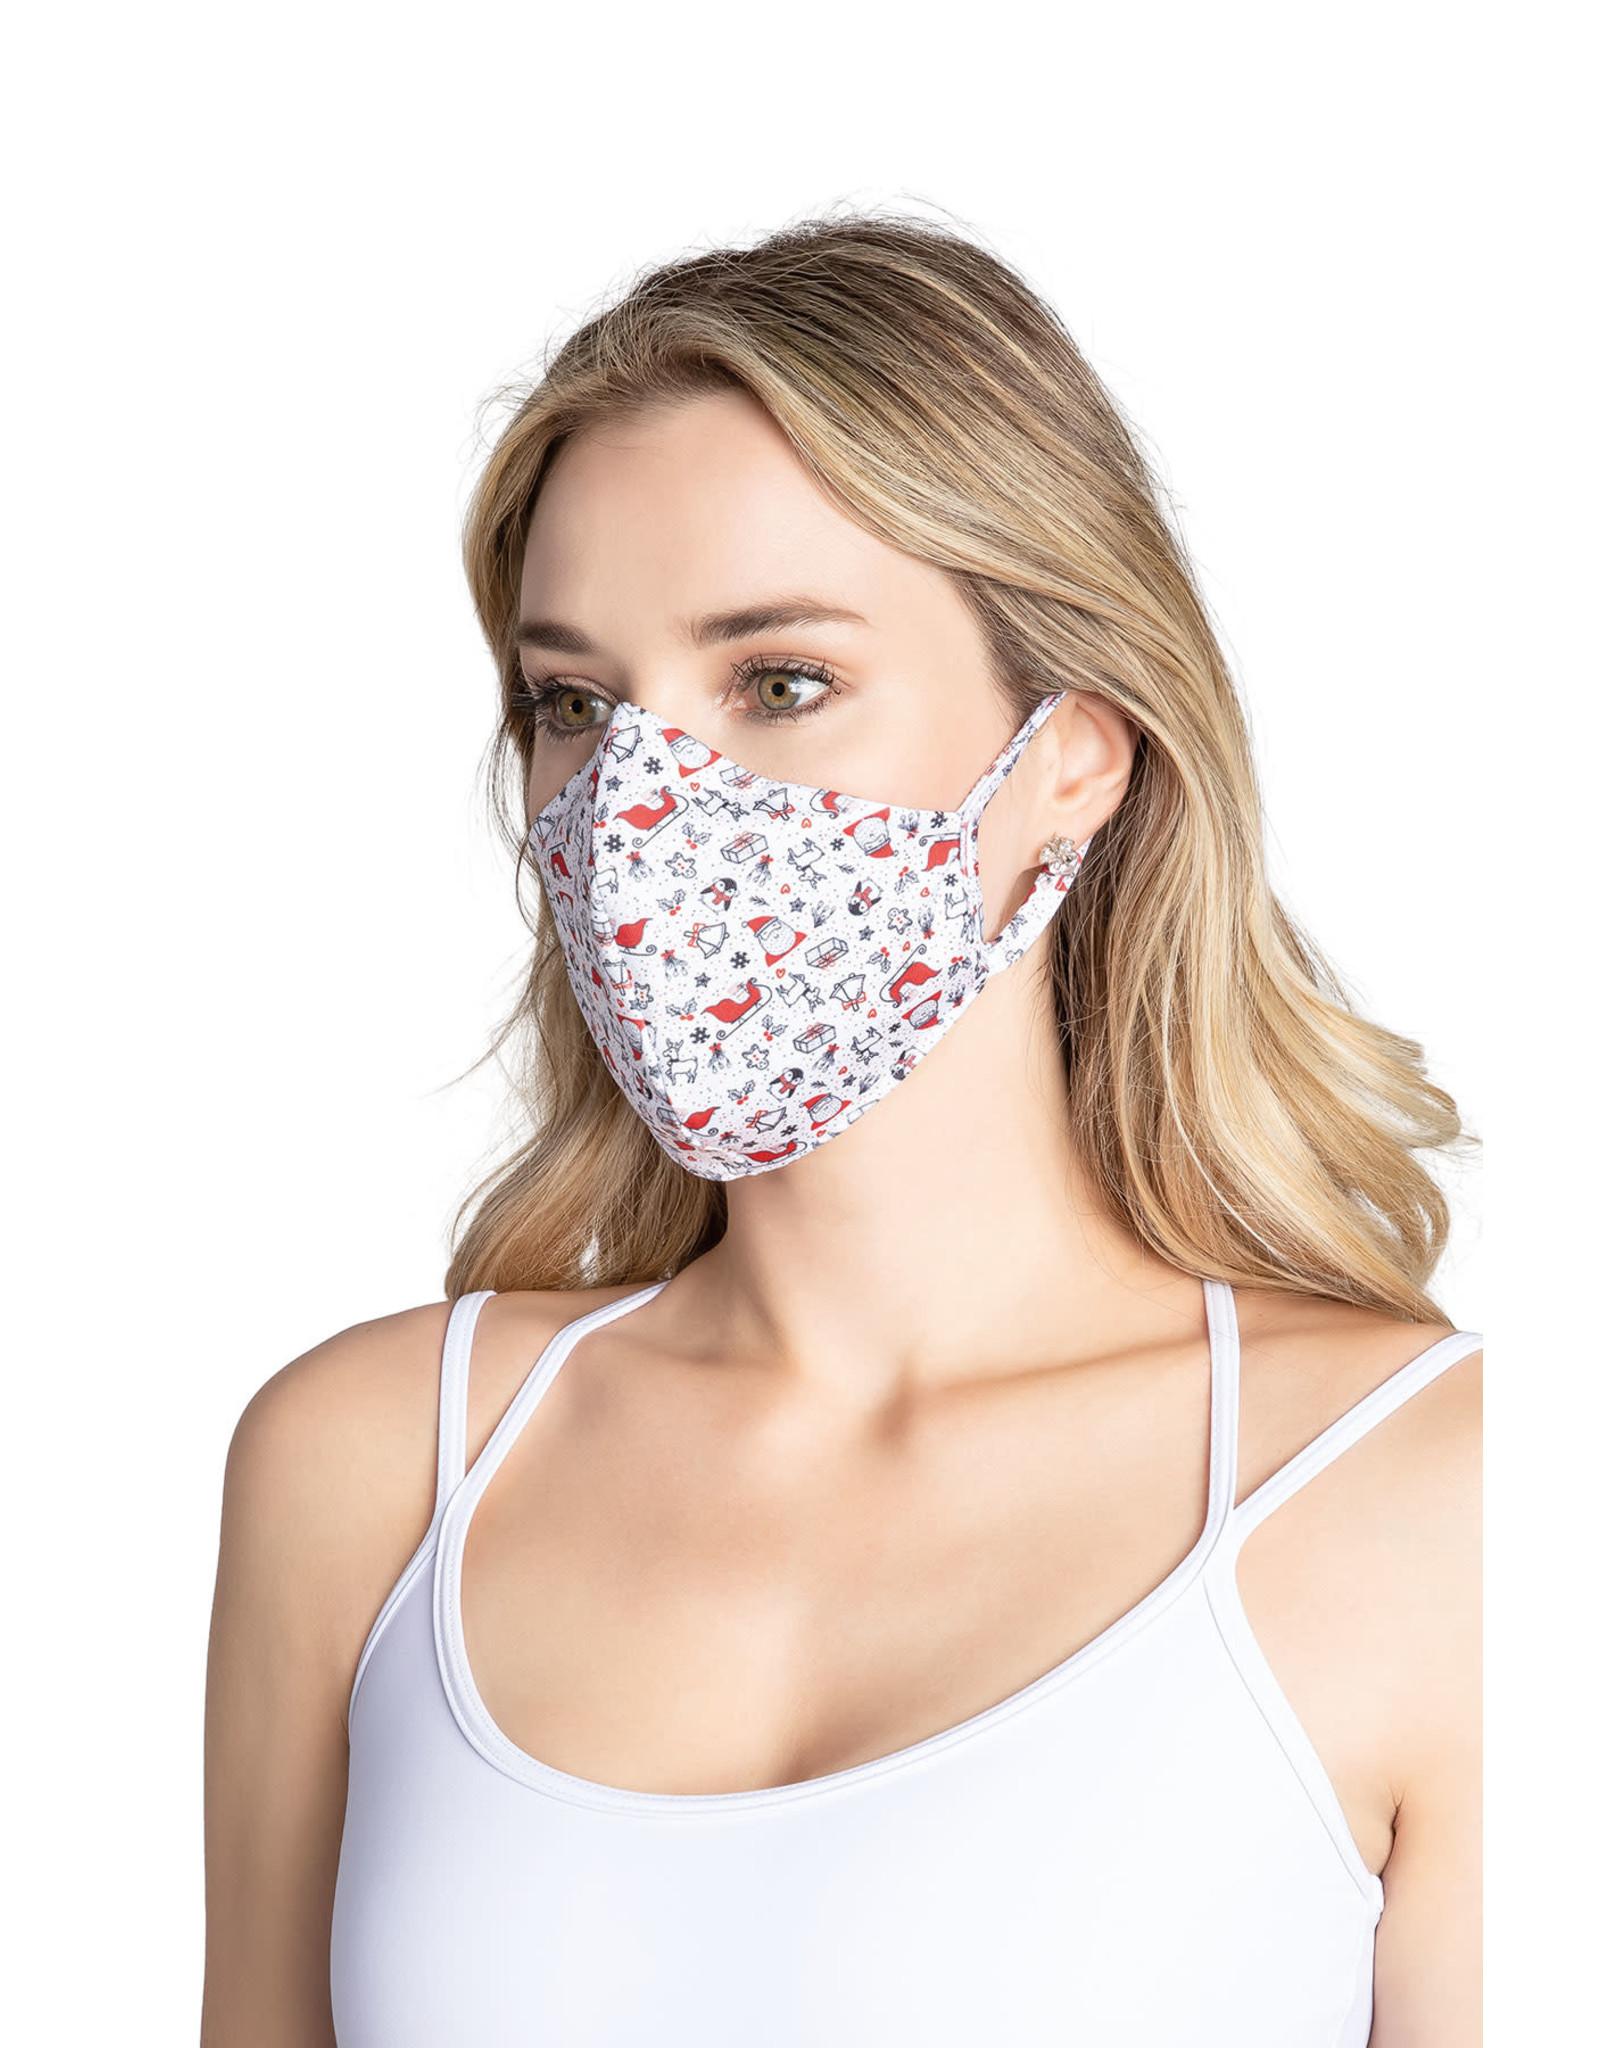 SoDanca SoDanca Adult face mask